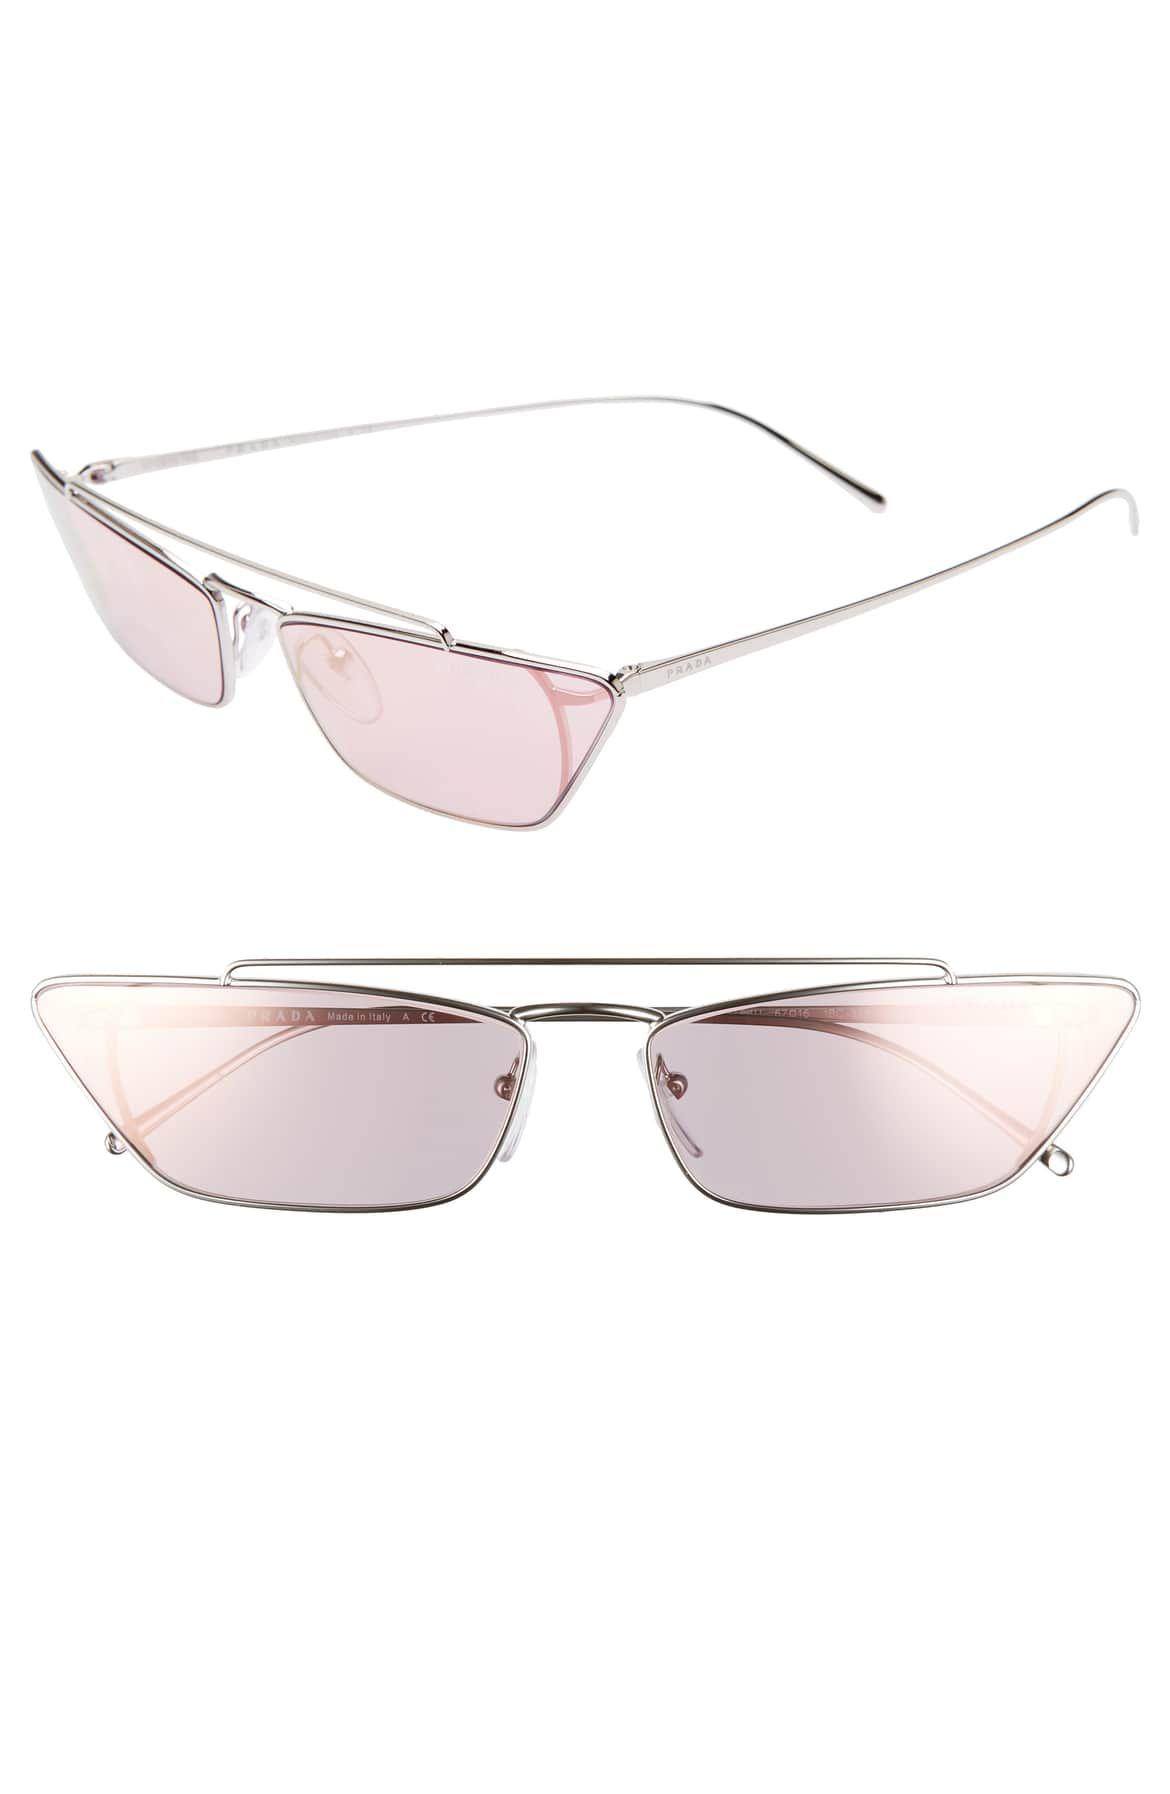 3addffa9a87 Ultravox 67mm Oversize Cat Eye Sunglasses